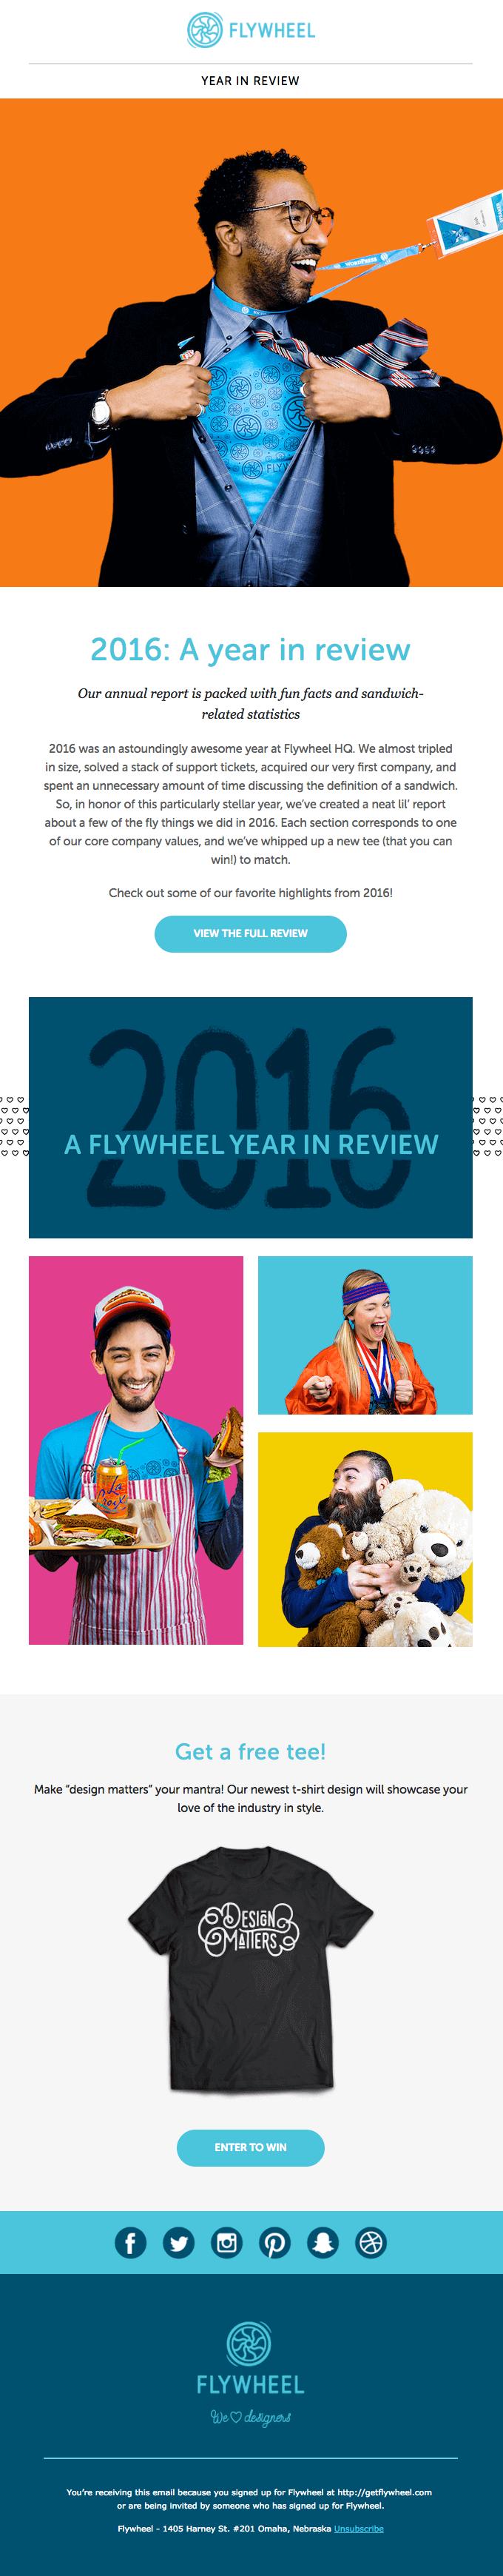 Flywheel-B2B-email